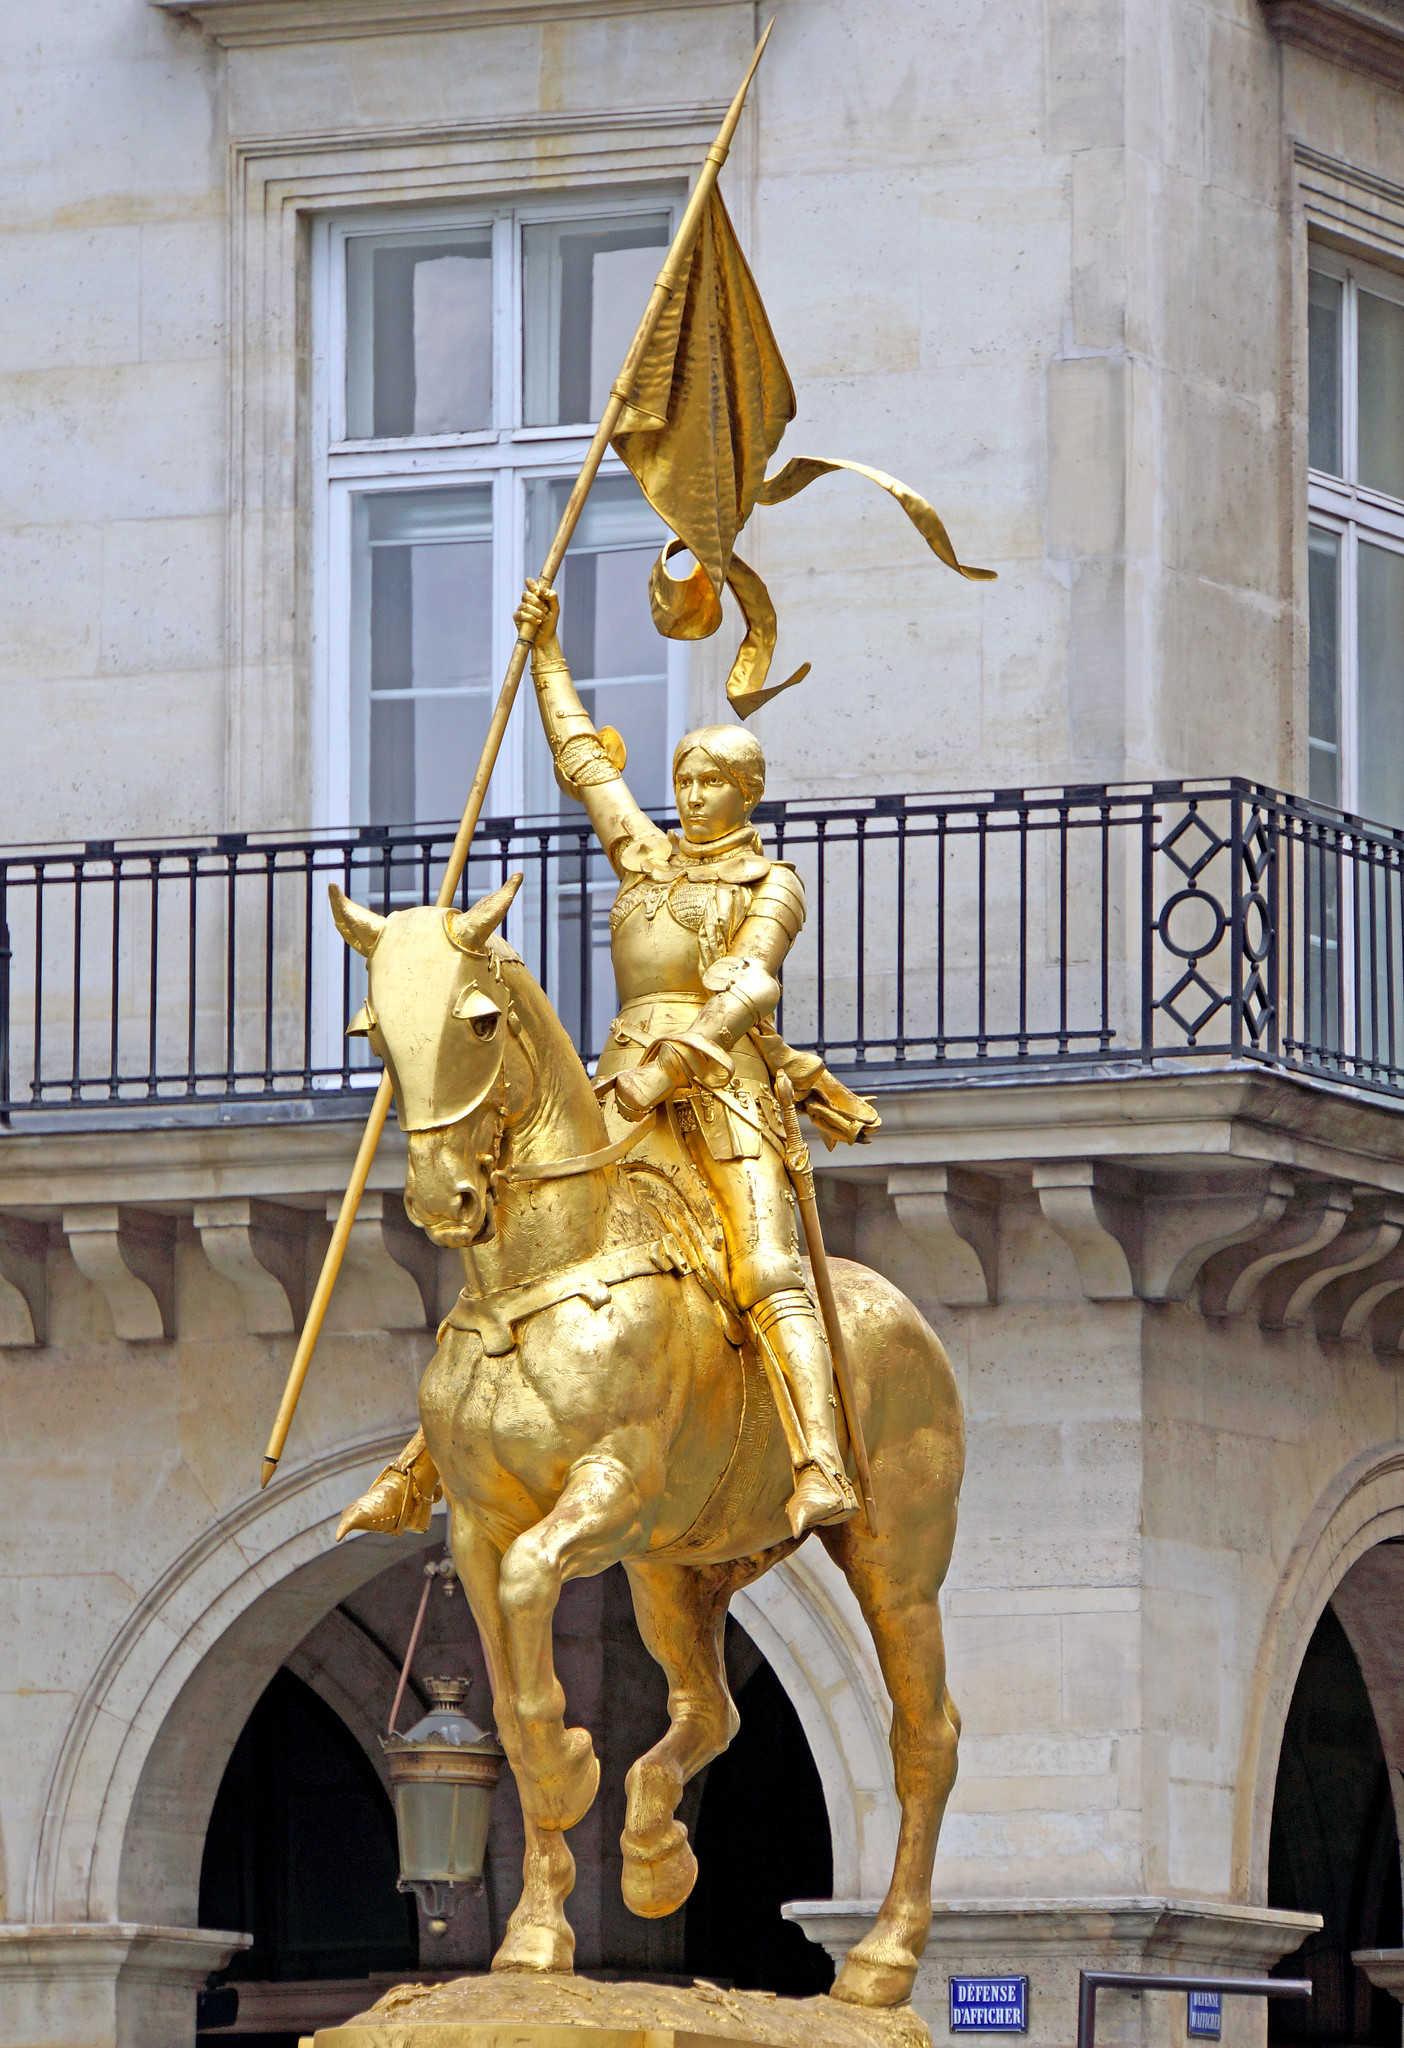 Rehabilitation trial of Joan of Arc